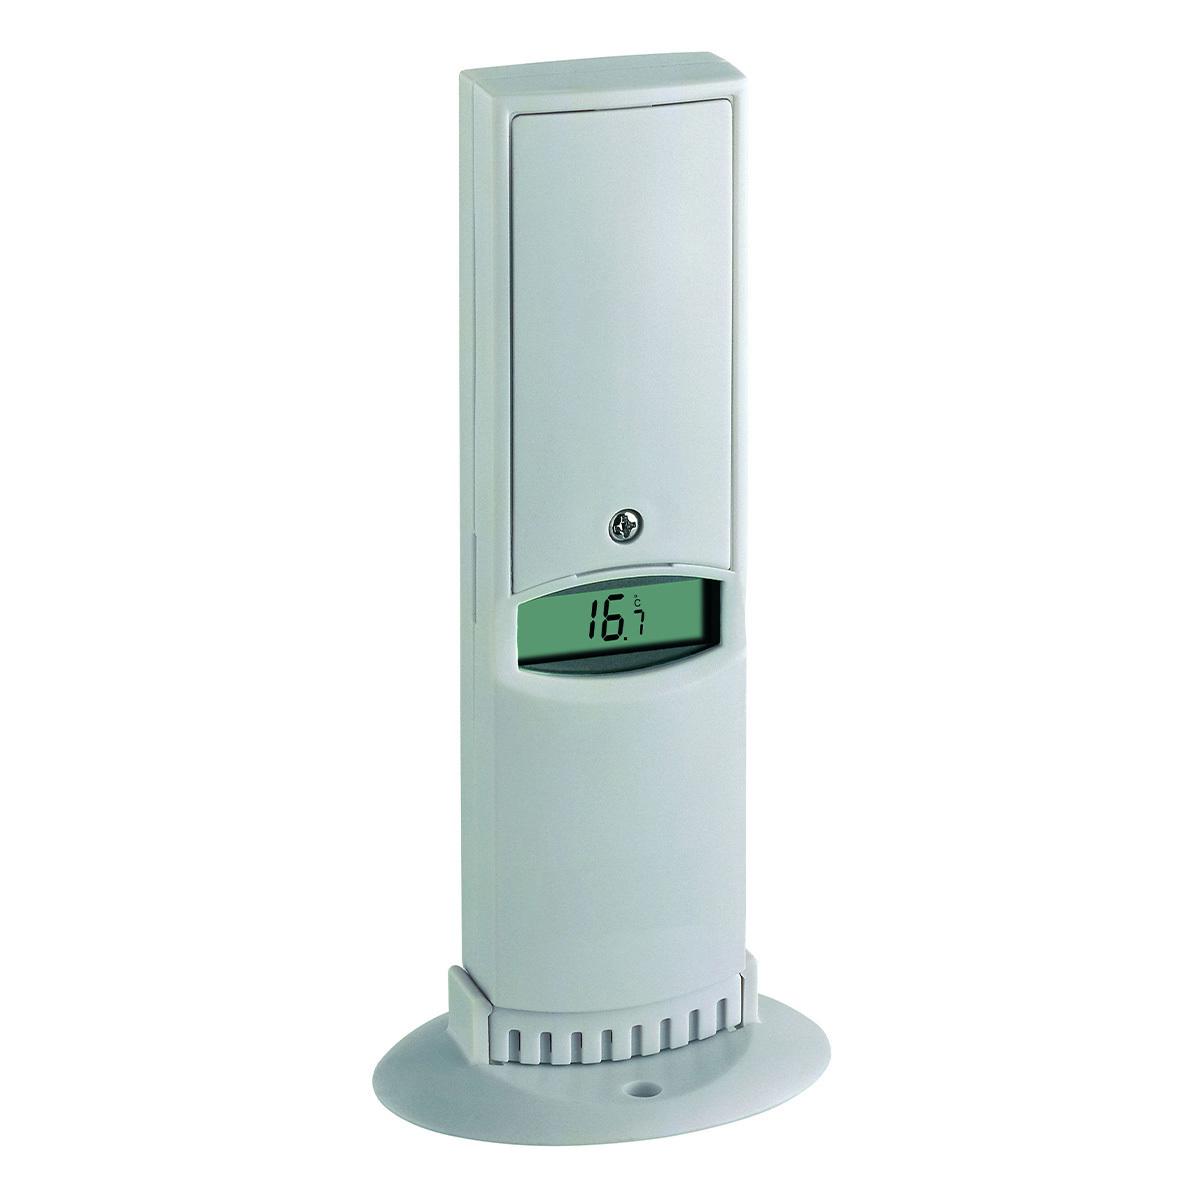 30-3144-it-thermo-hygro-sender-1200x200px.jpg